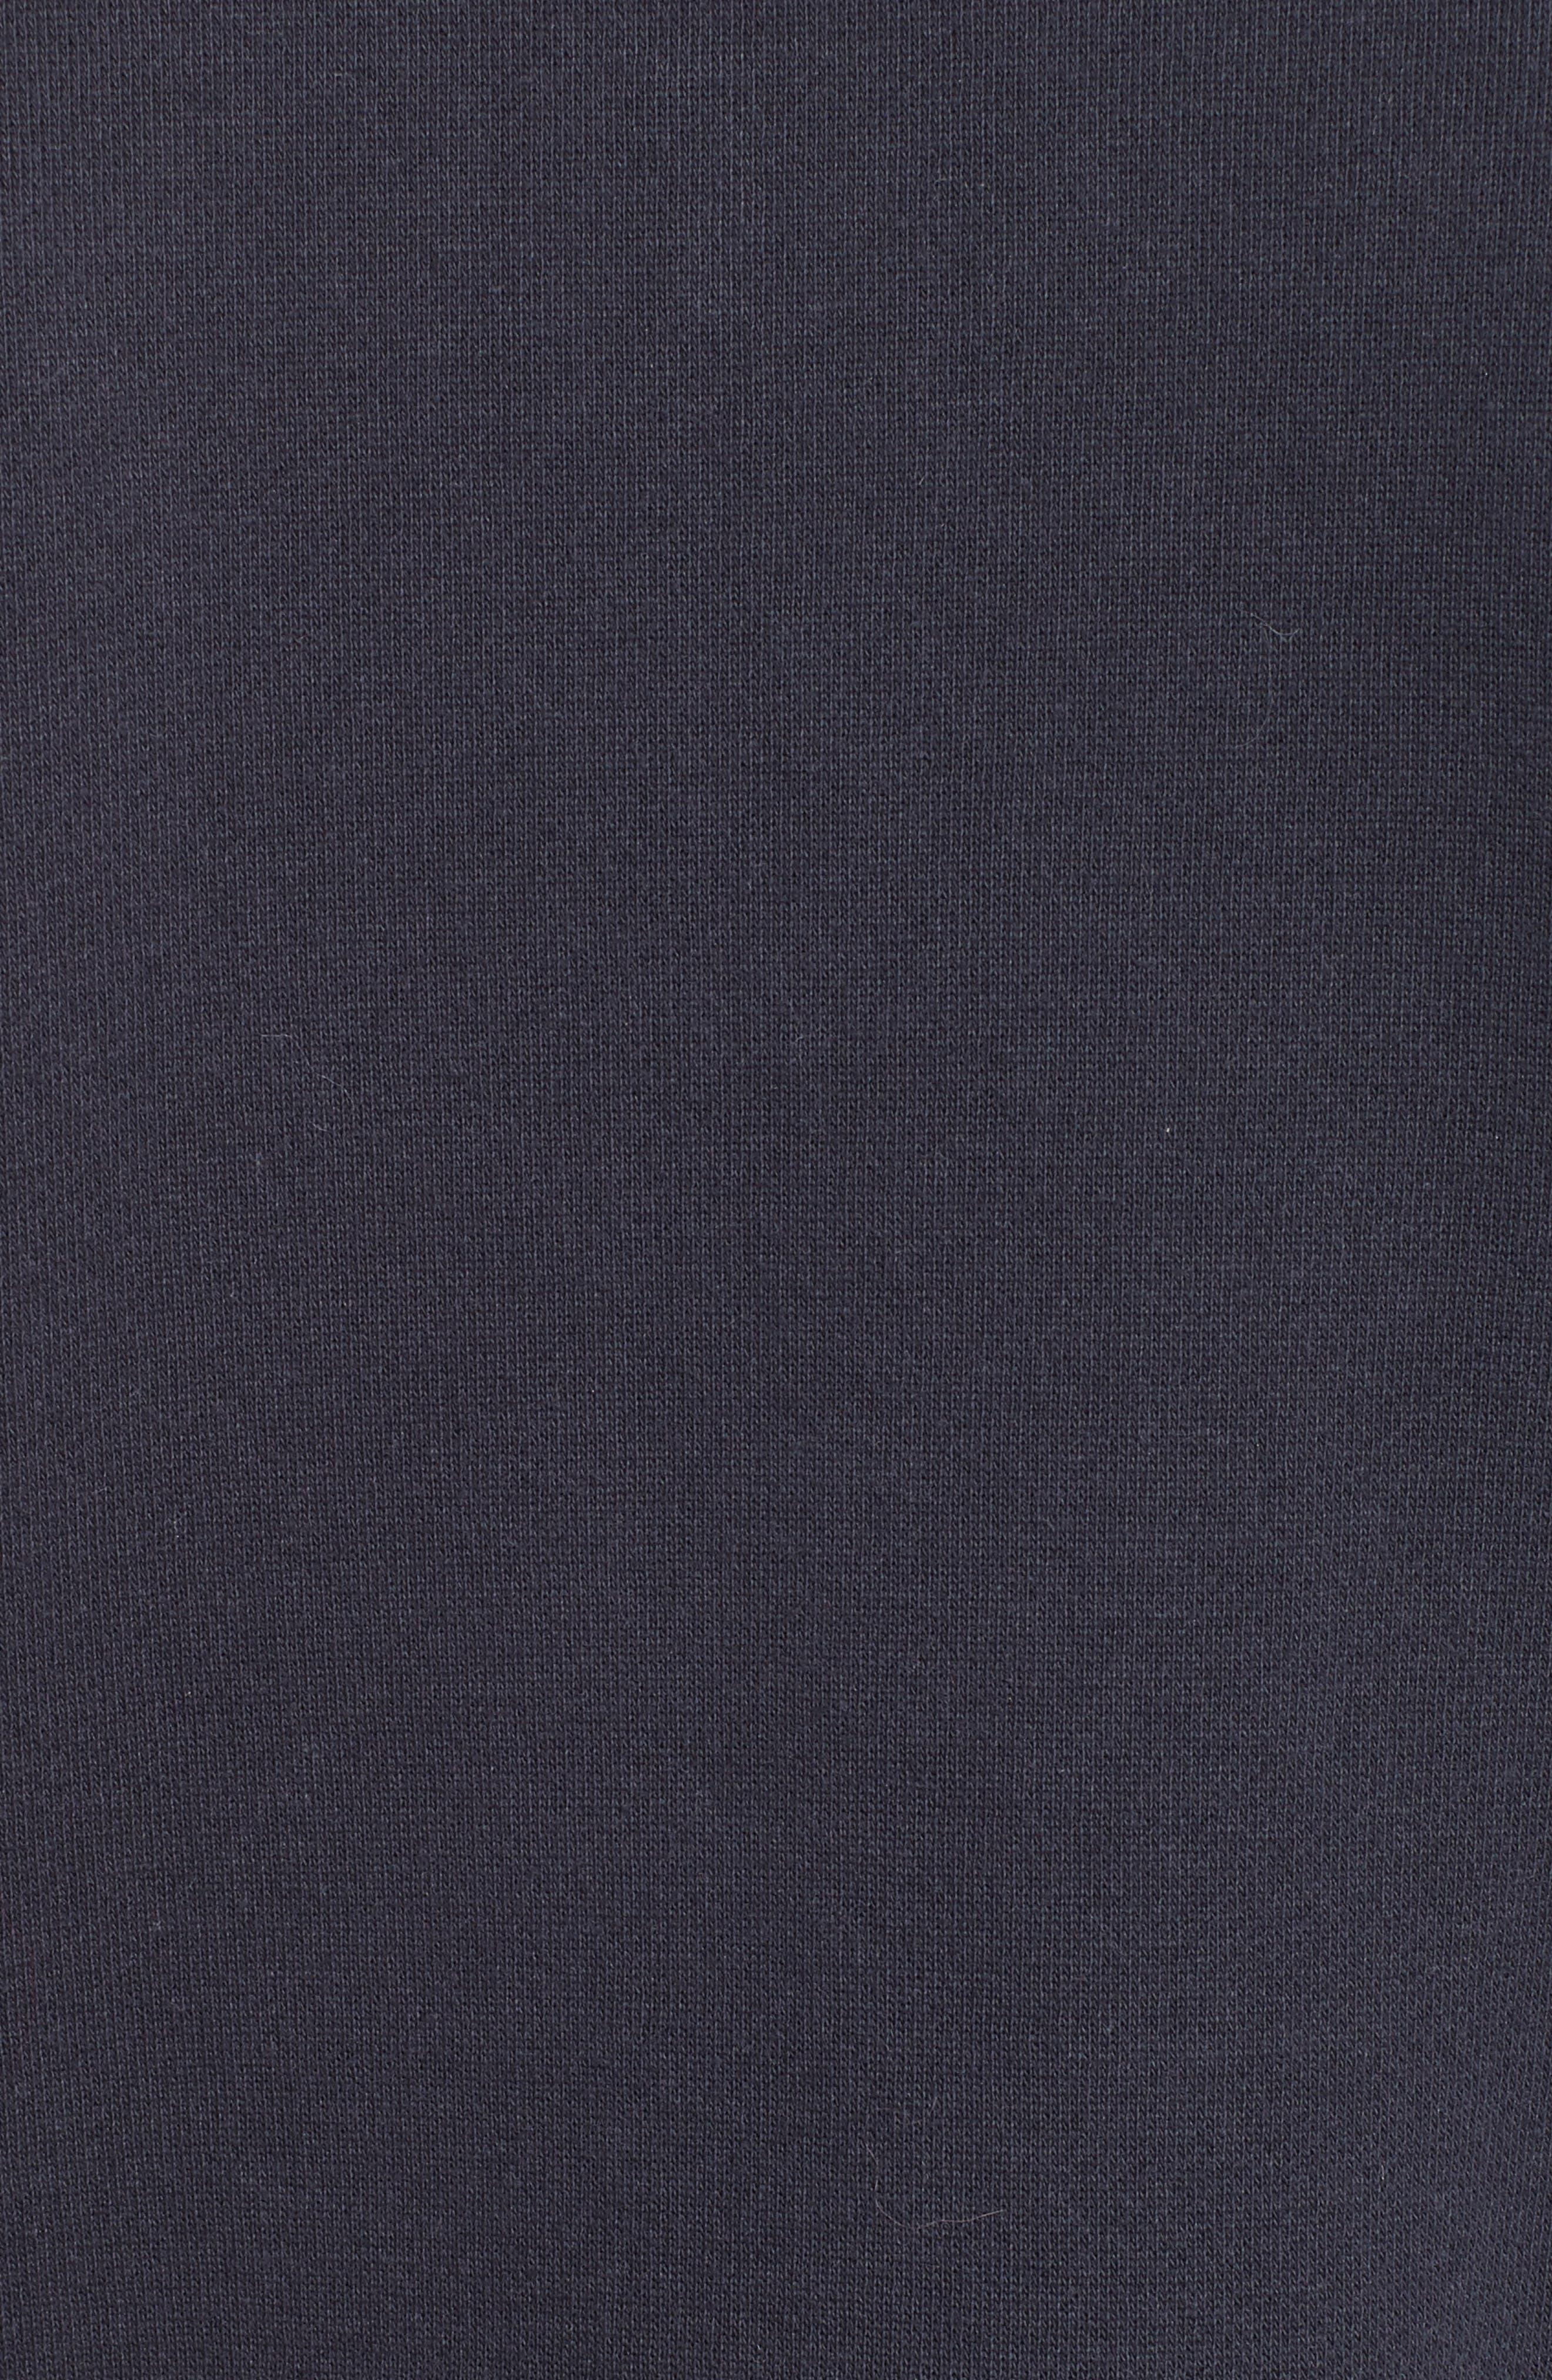 Turtleneck Fleece Zip Pullover,                             Alternate thumbnail 5, color,                             403